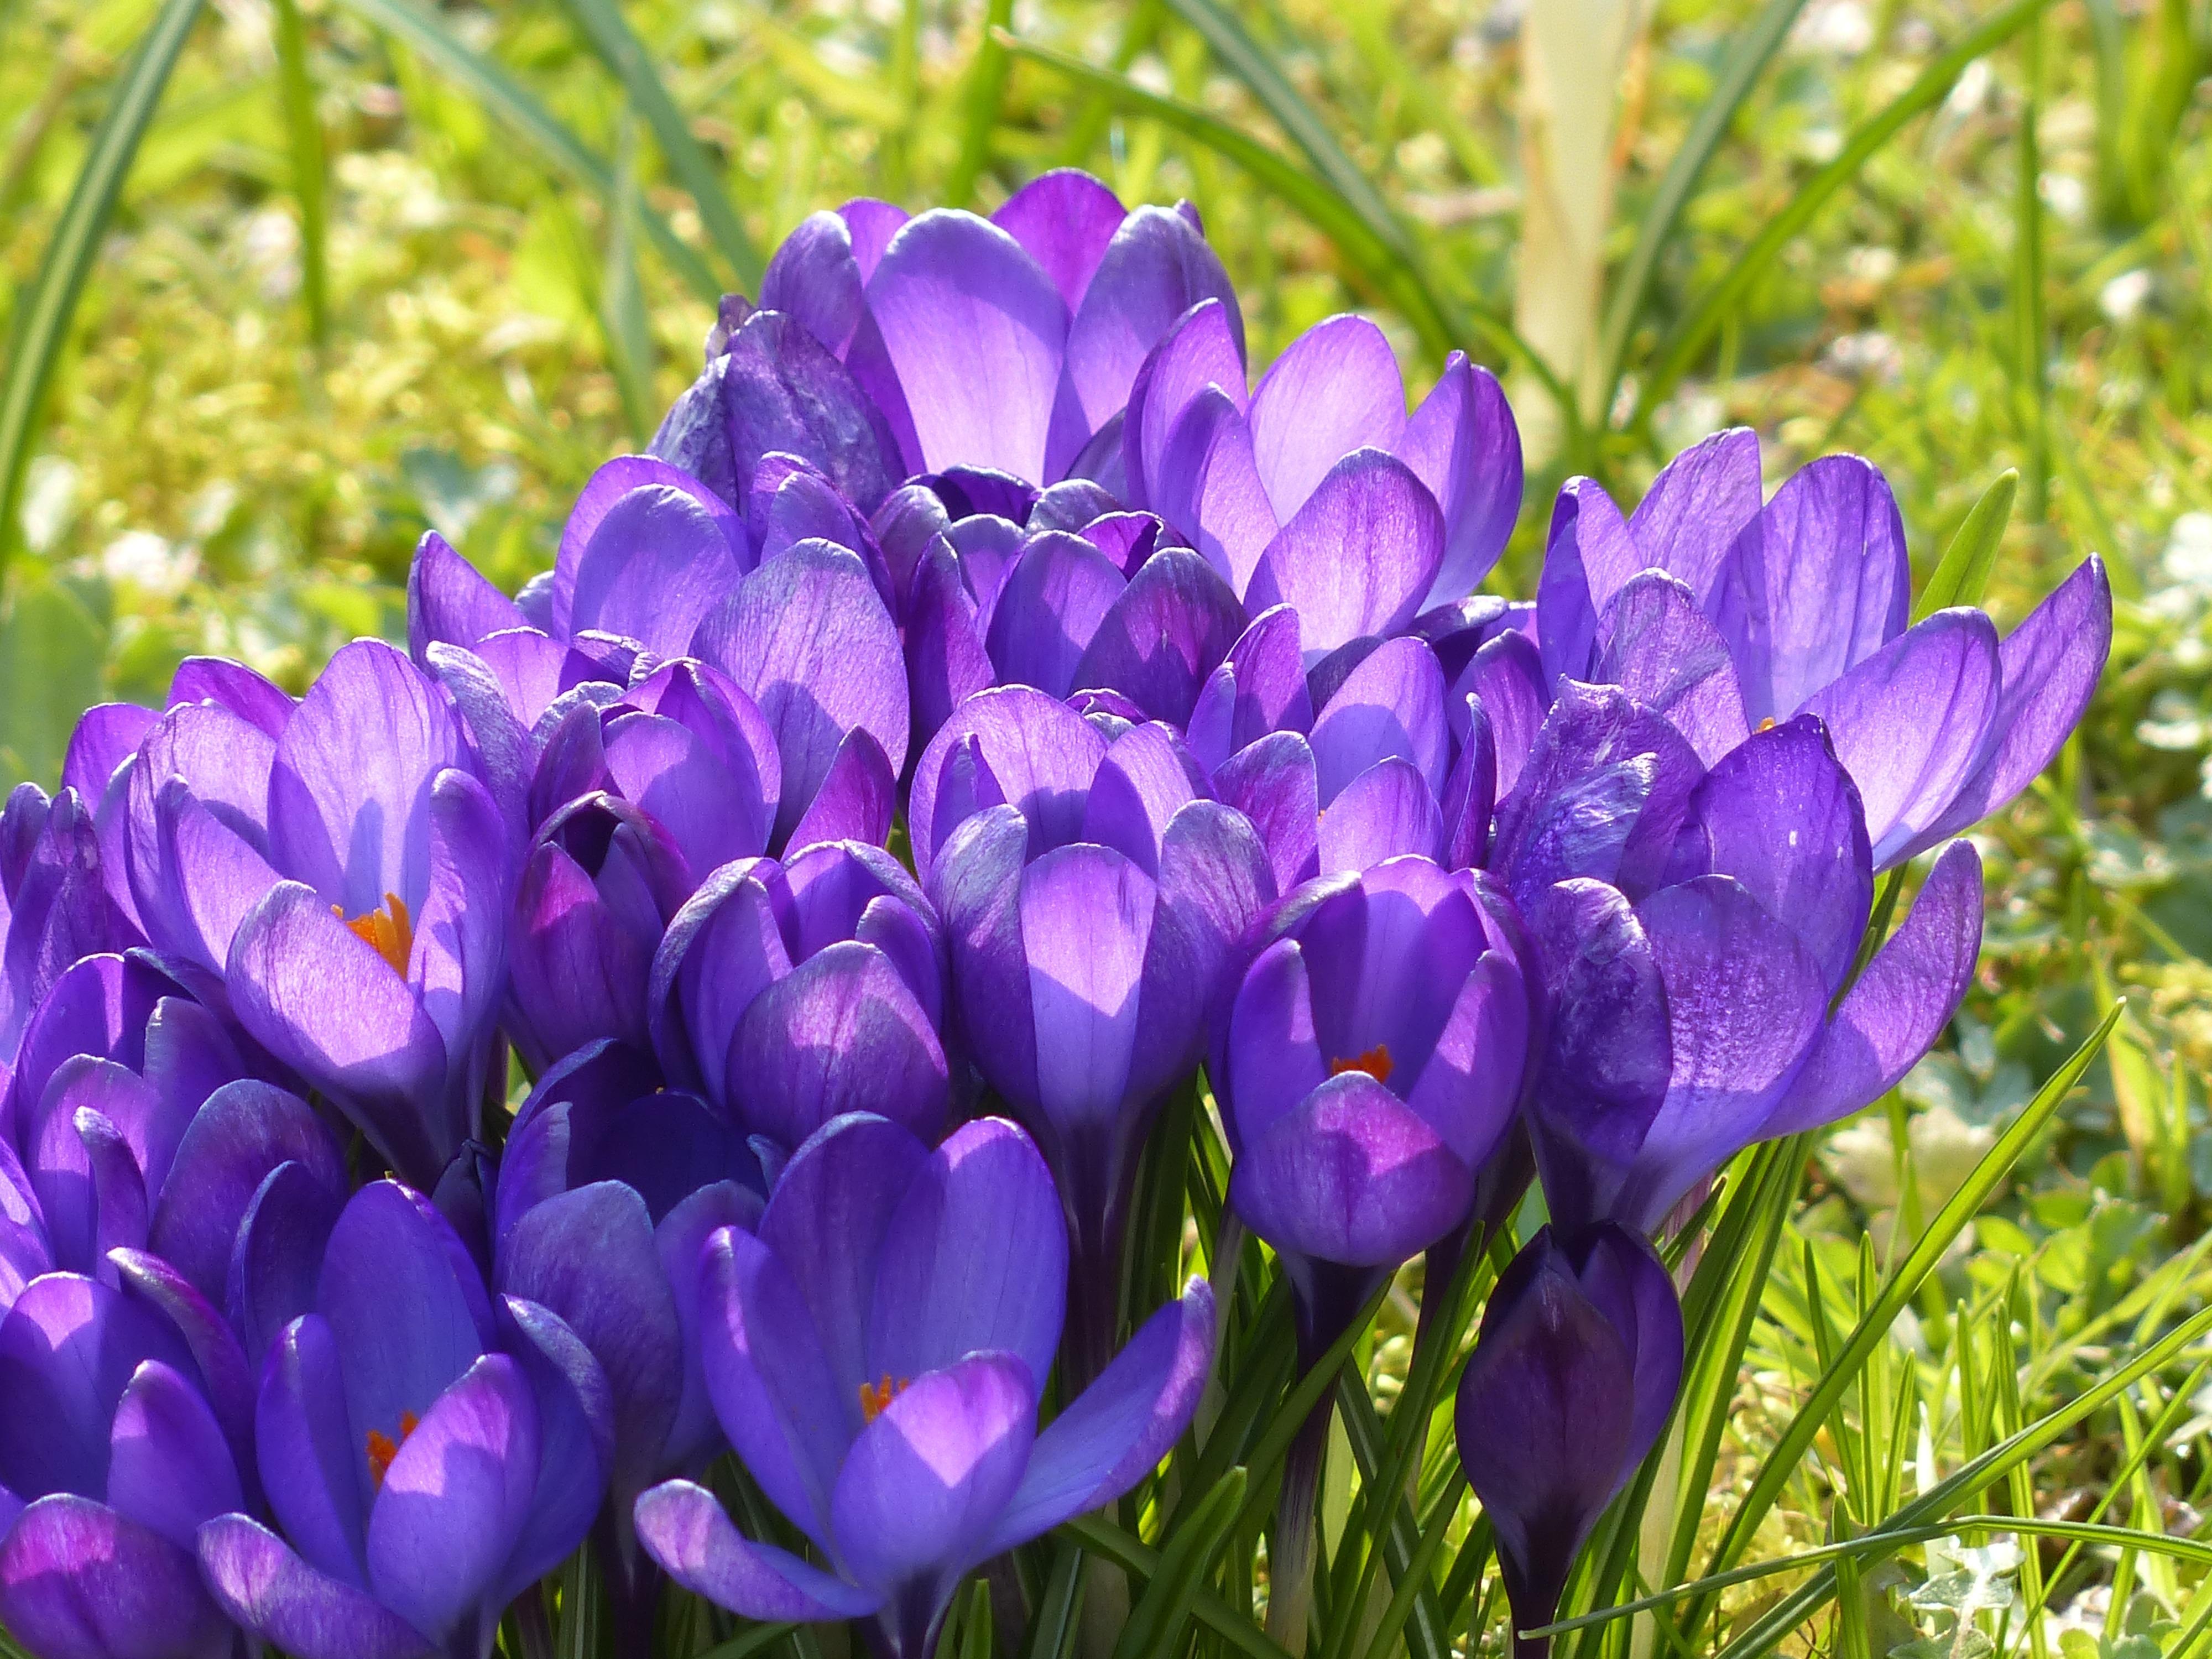 Free Images Nature Blossom Flower Purple Petal Bloom Botany